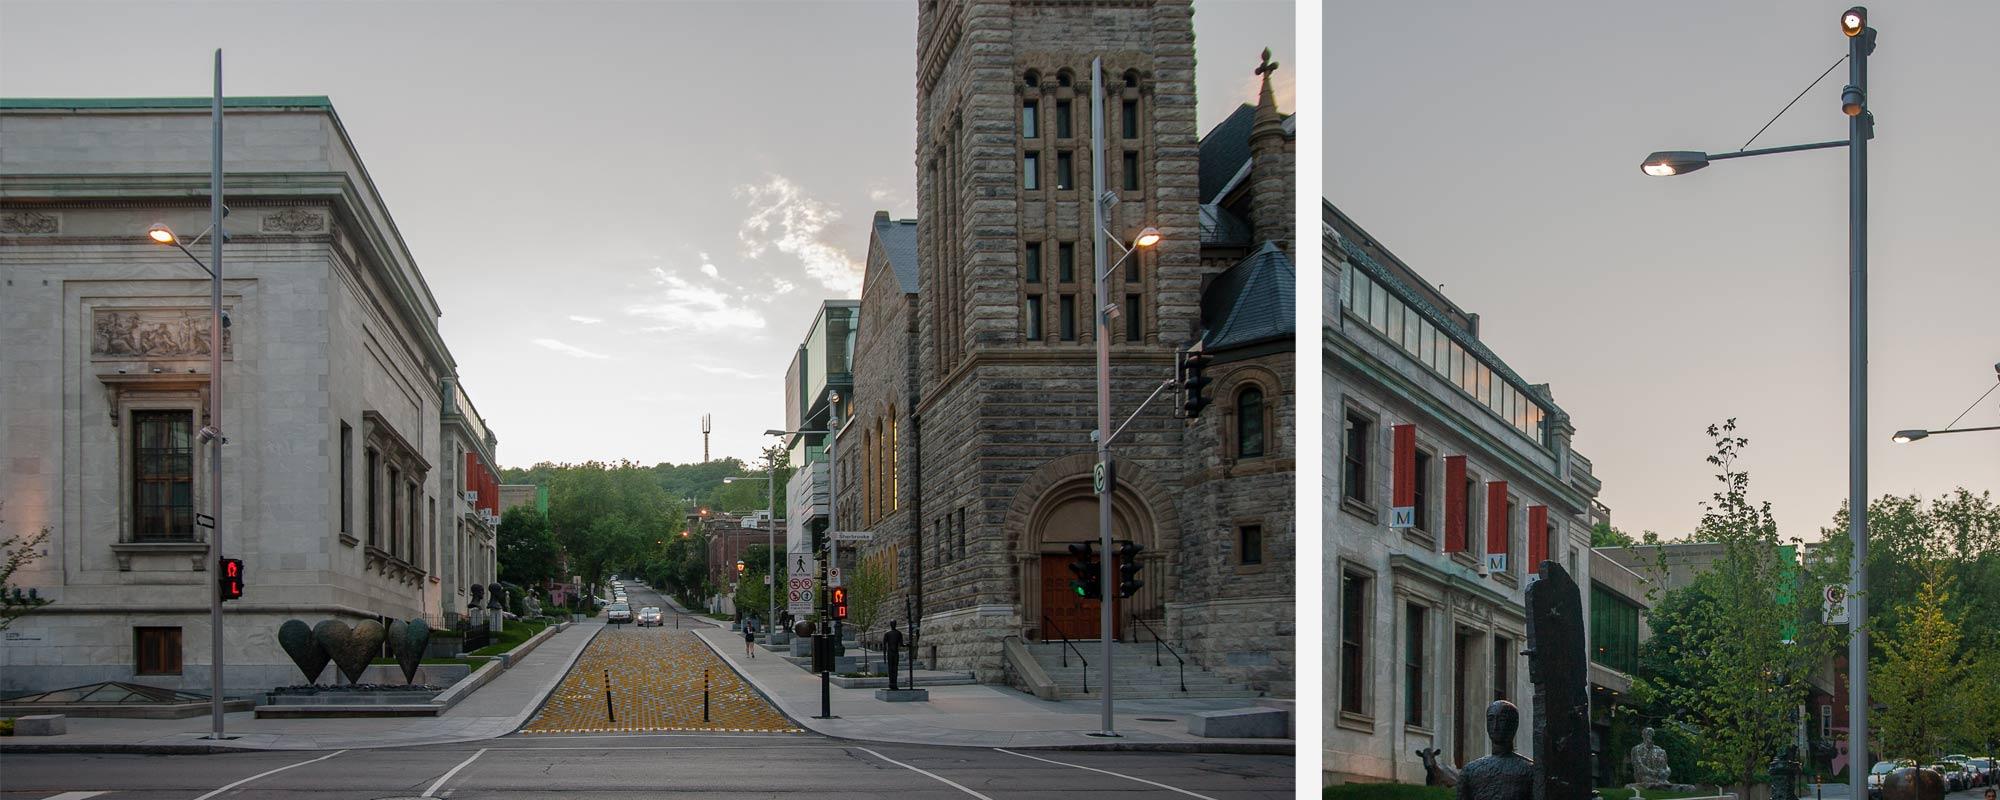 D_Montreal-musee-des-beaux-